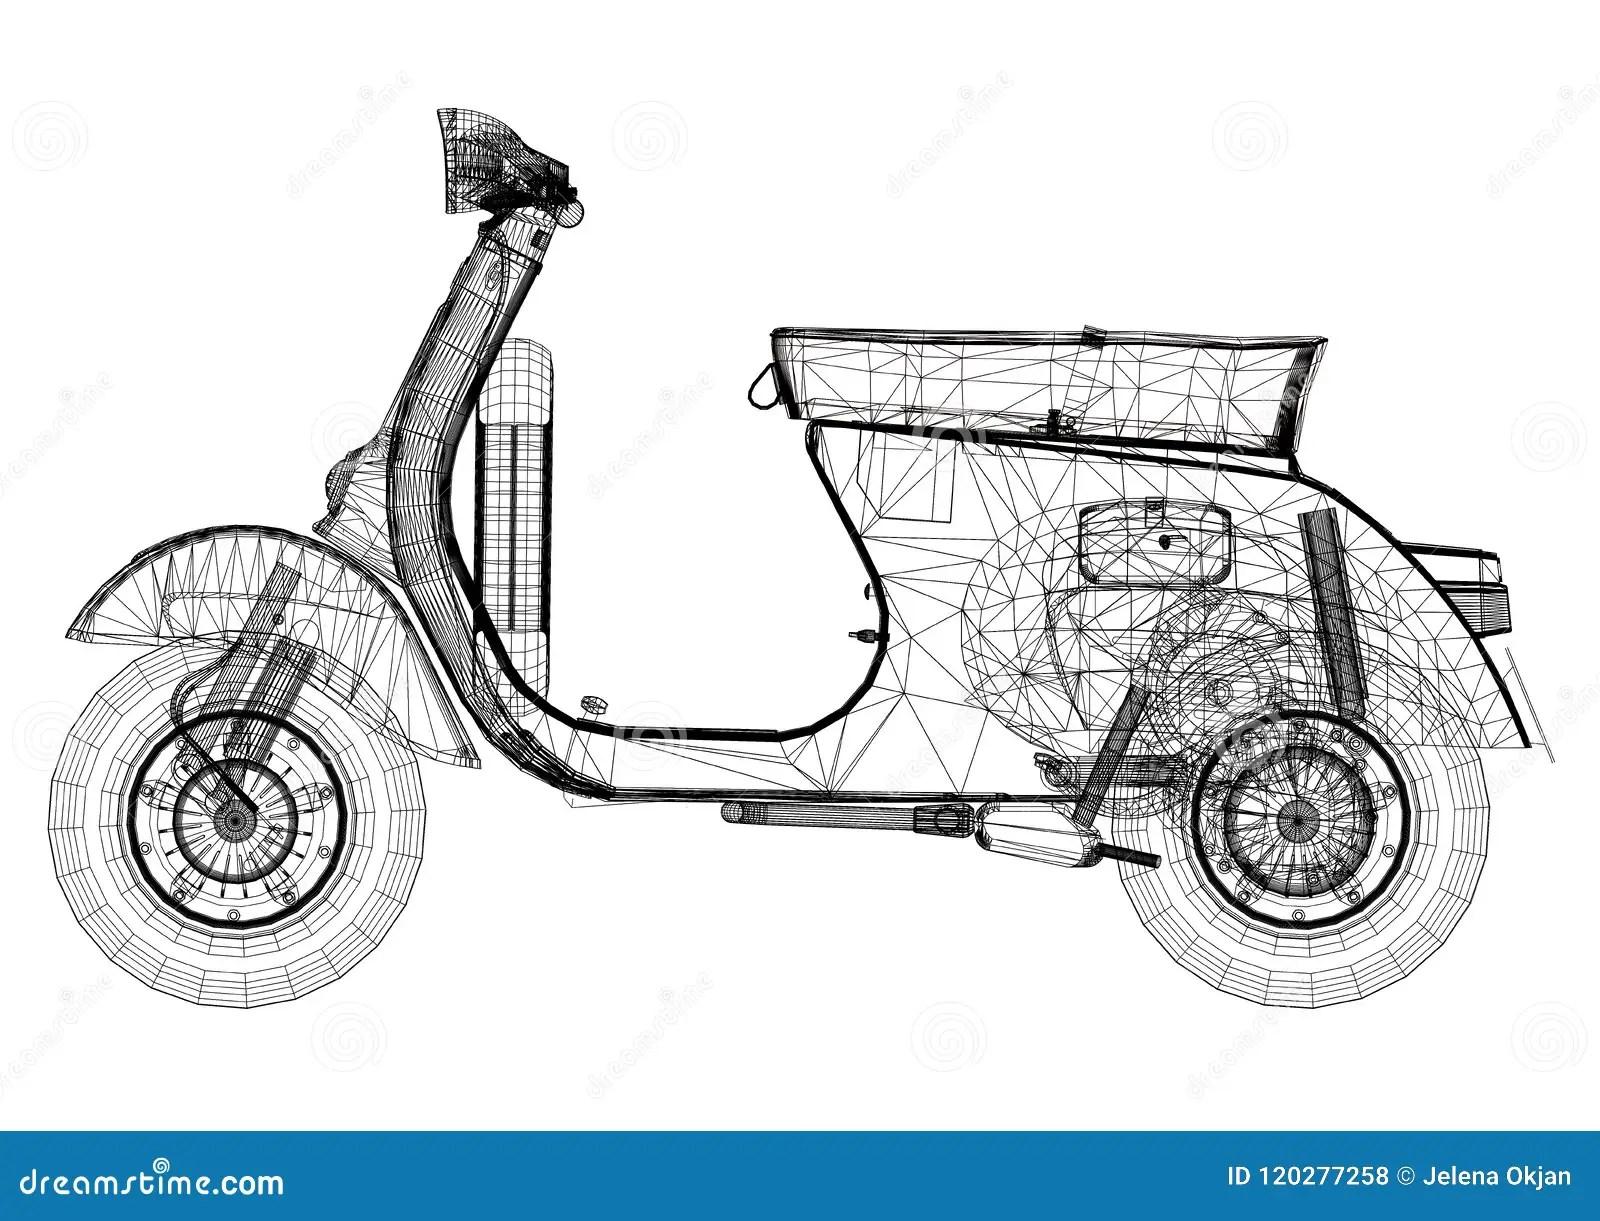 Scooter Architect Blueprint